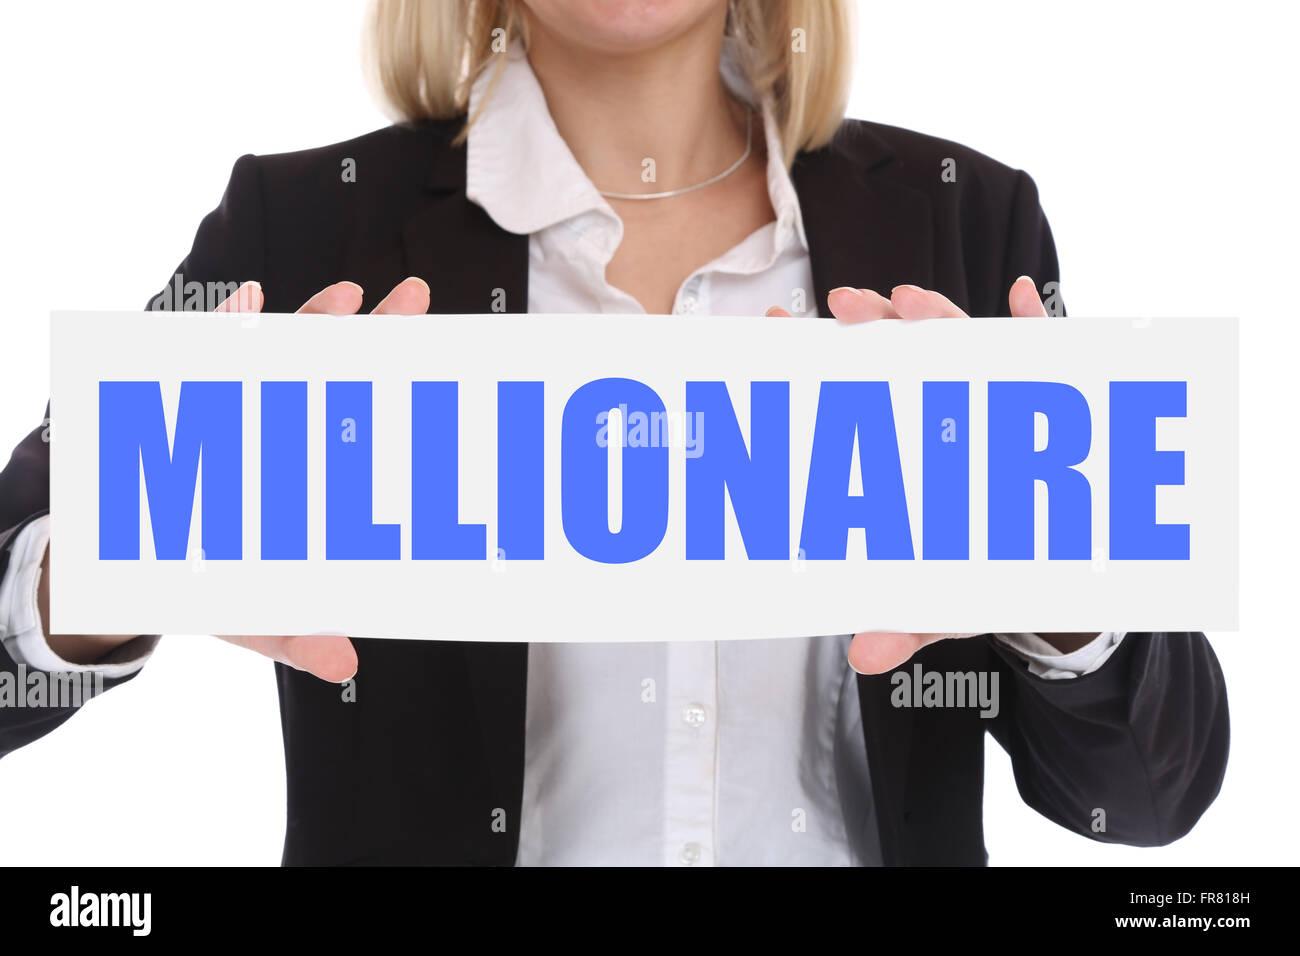 Concepto de negocio millonario rica empresaria exitosa éxito liderazgo finanzas Imagen De Stock